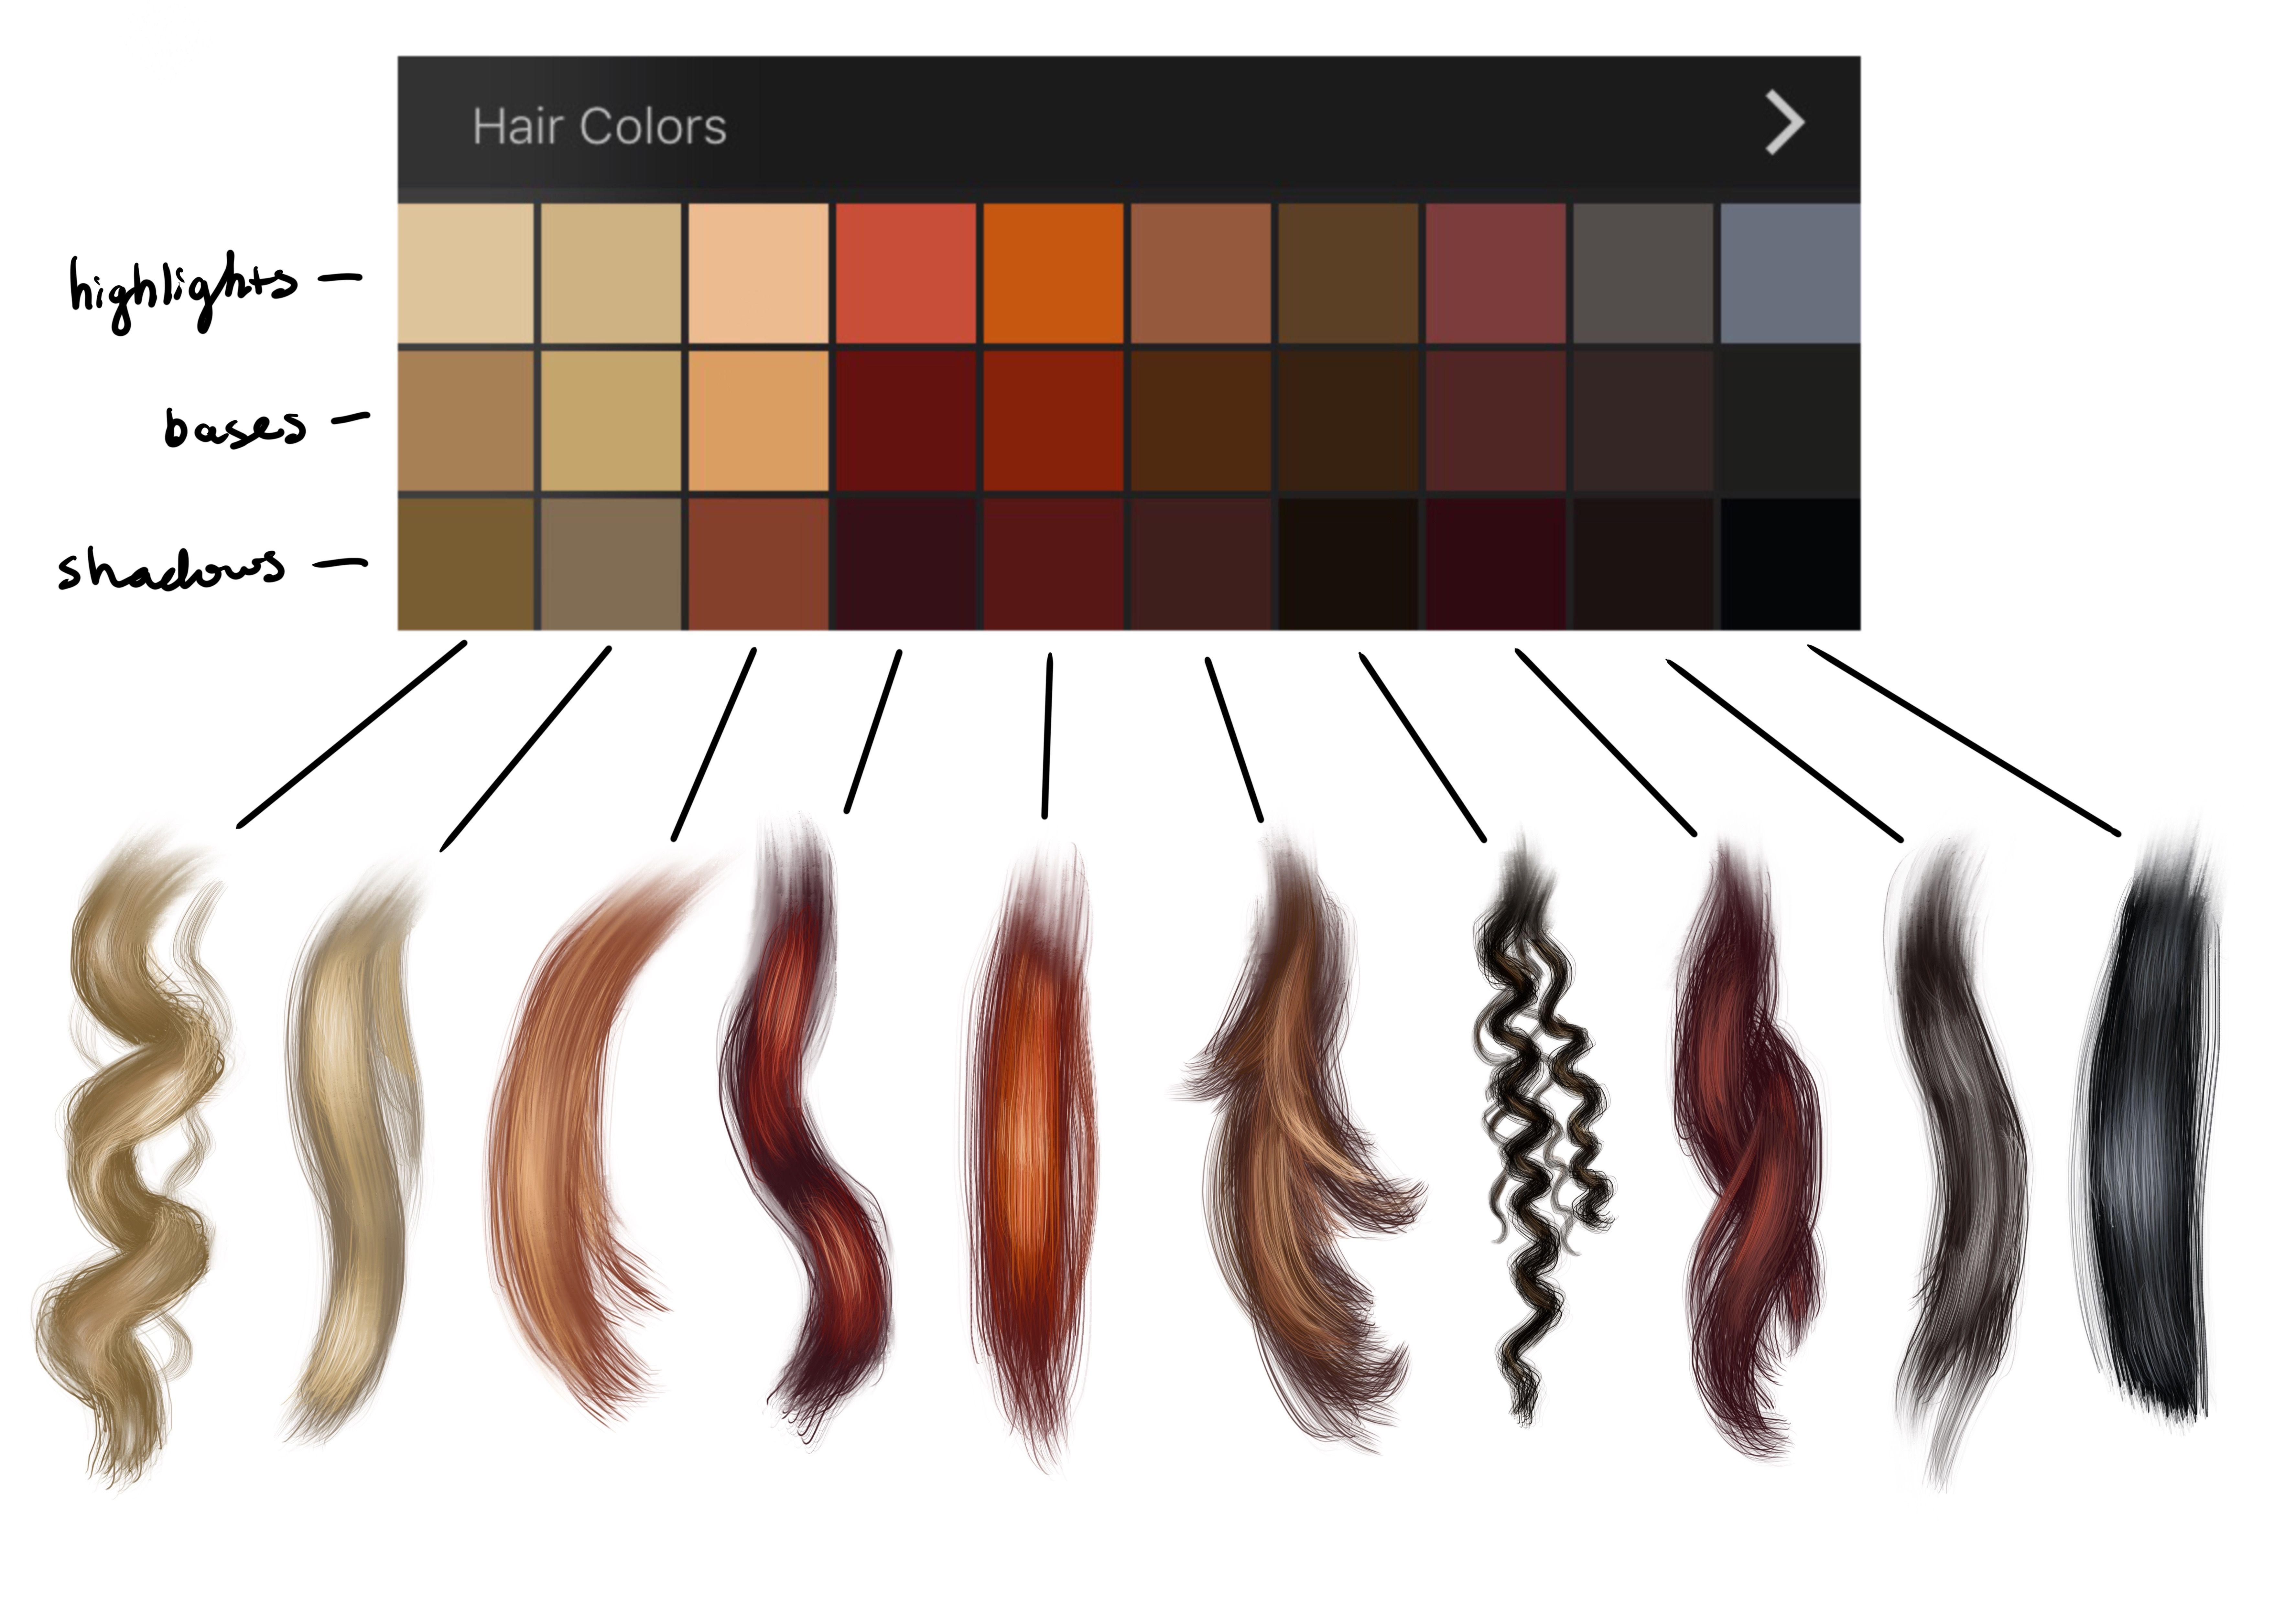 Hair Colors Palette Swatches In 2020 Palette Art Procreate Ipad Art Digital Art Tutorial